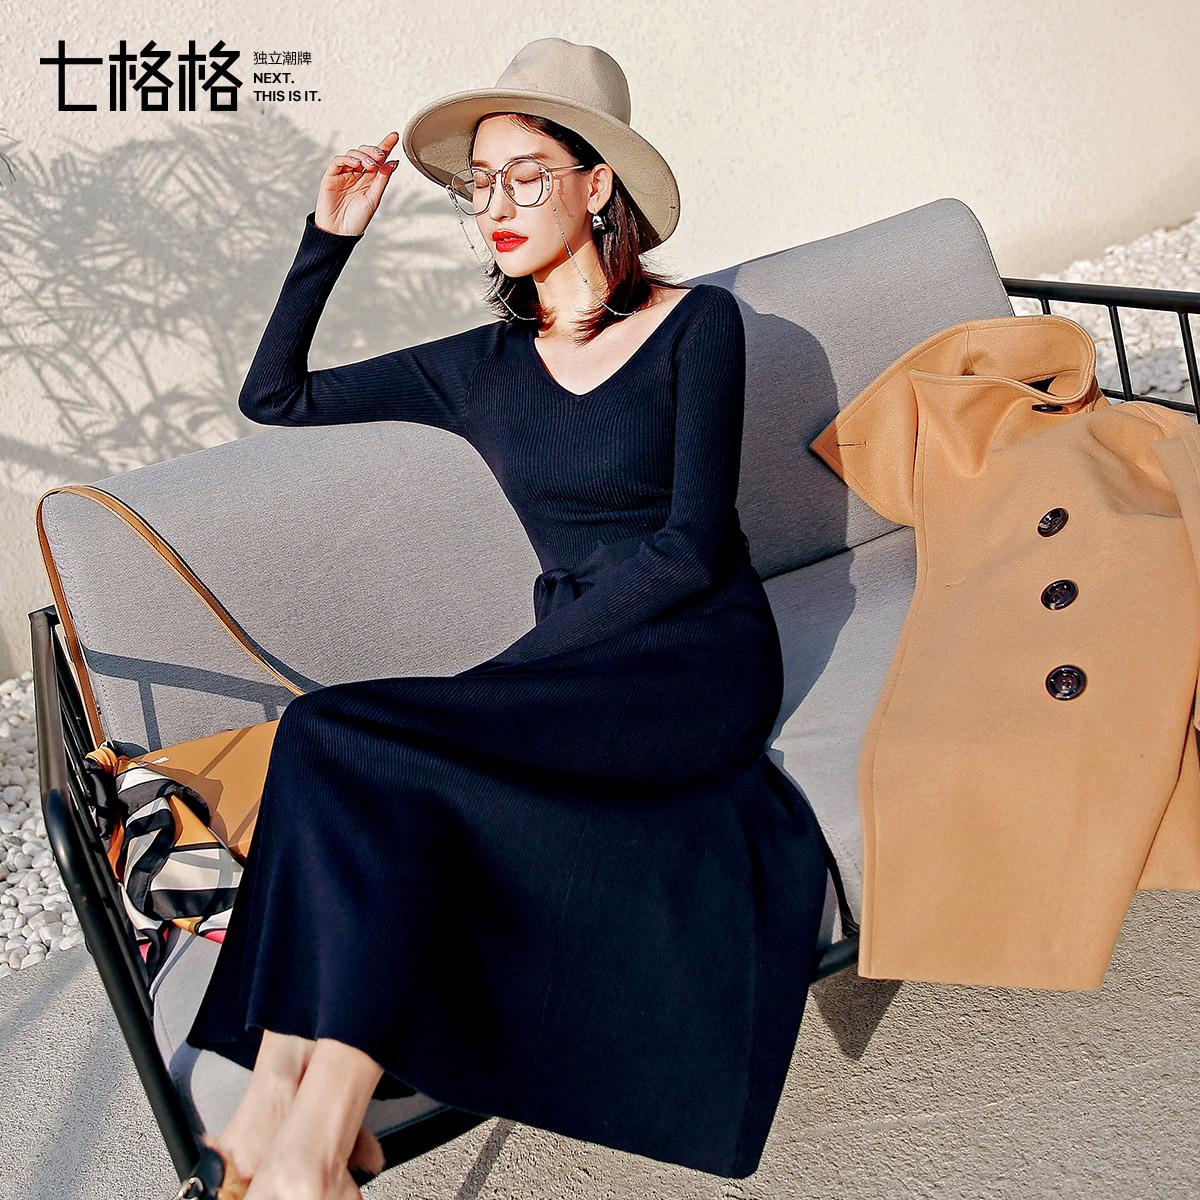 v领针织连衣裙秋装女2018新款韩版修身sukol裙少女心机裙子设计感